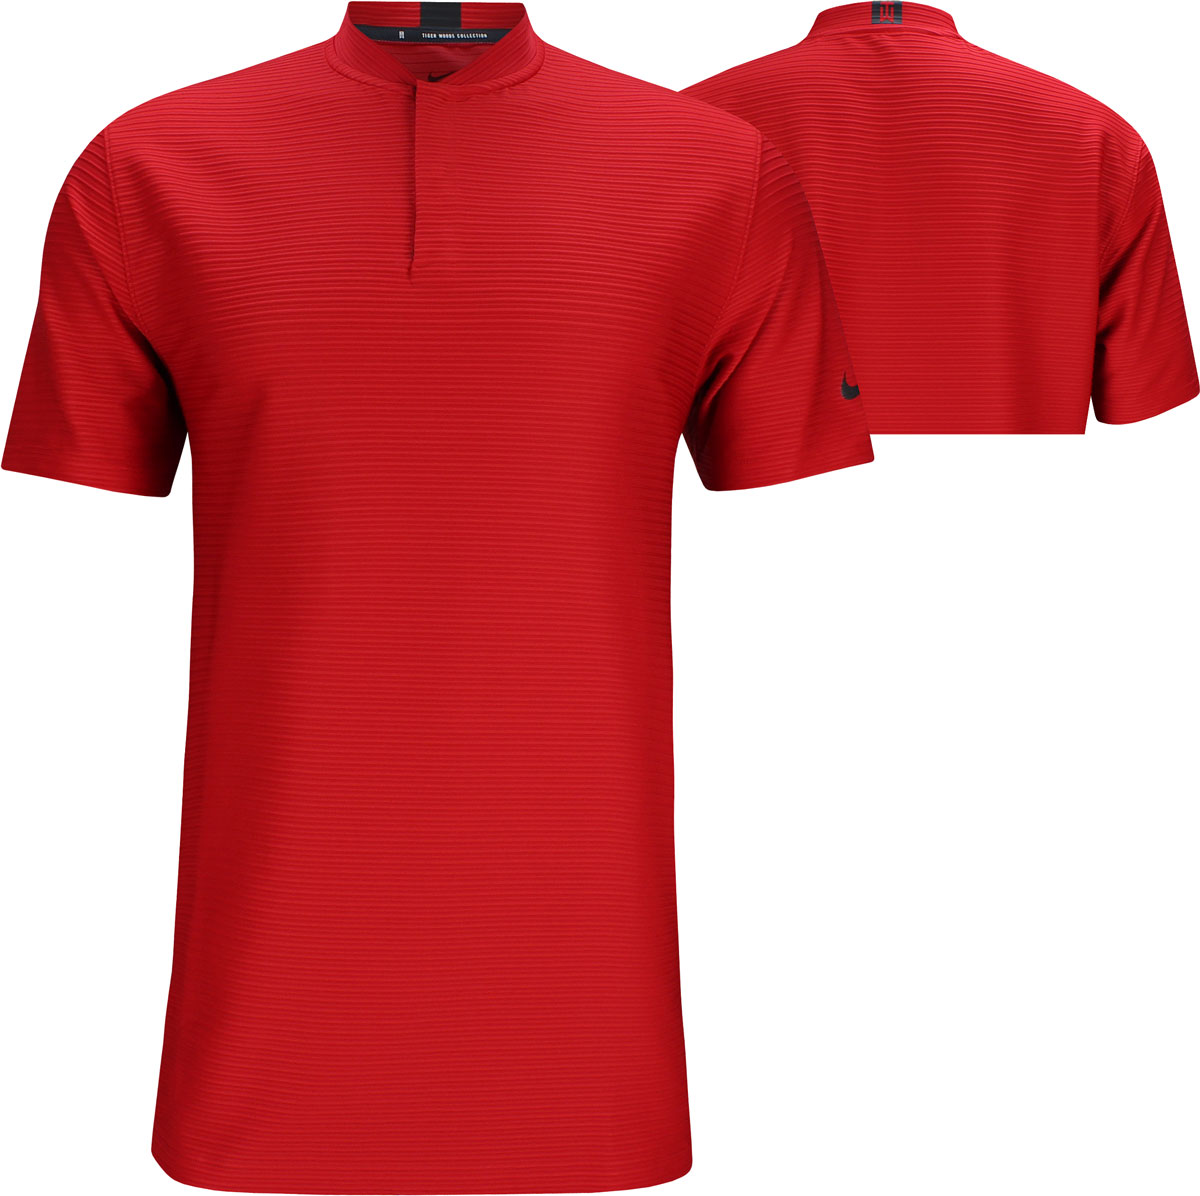 tiger woods golf clothing nike online